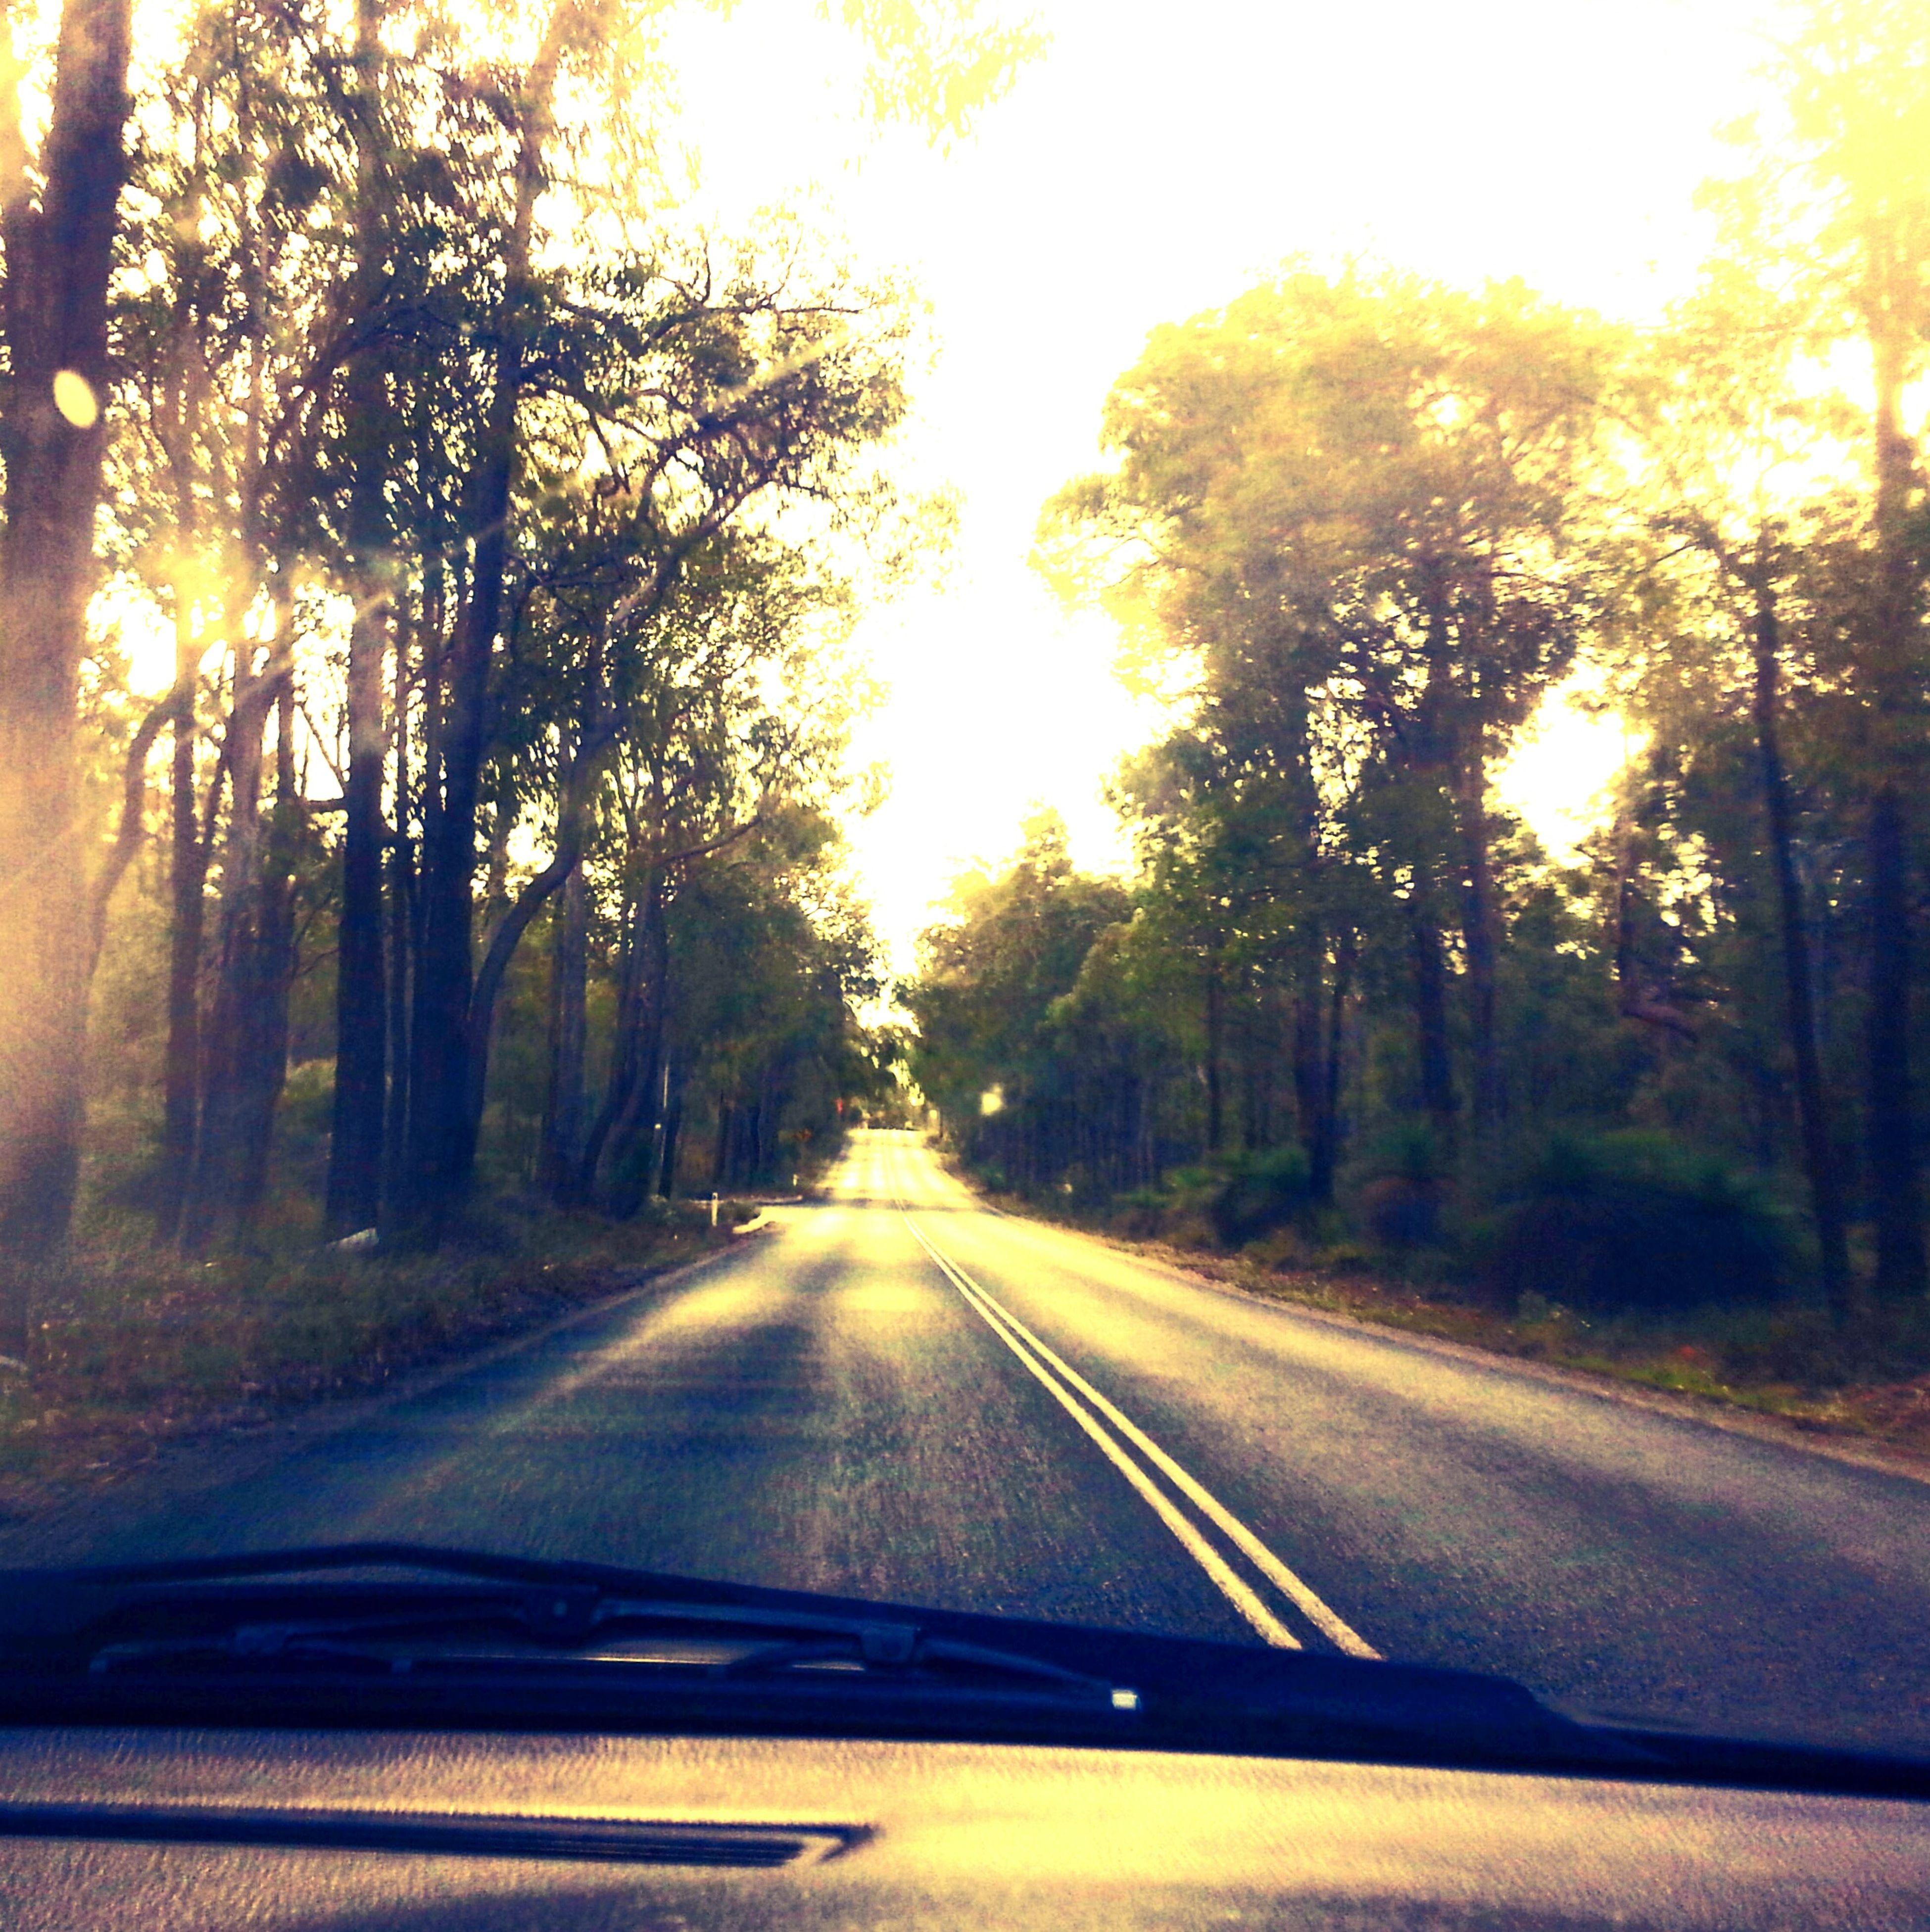 the Road Beneath My Wheels